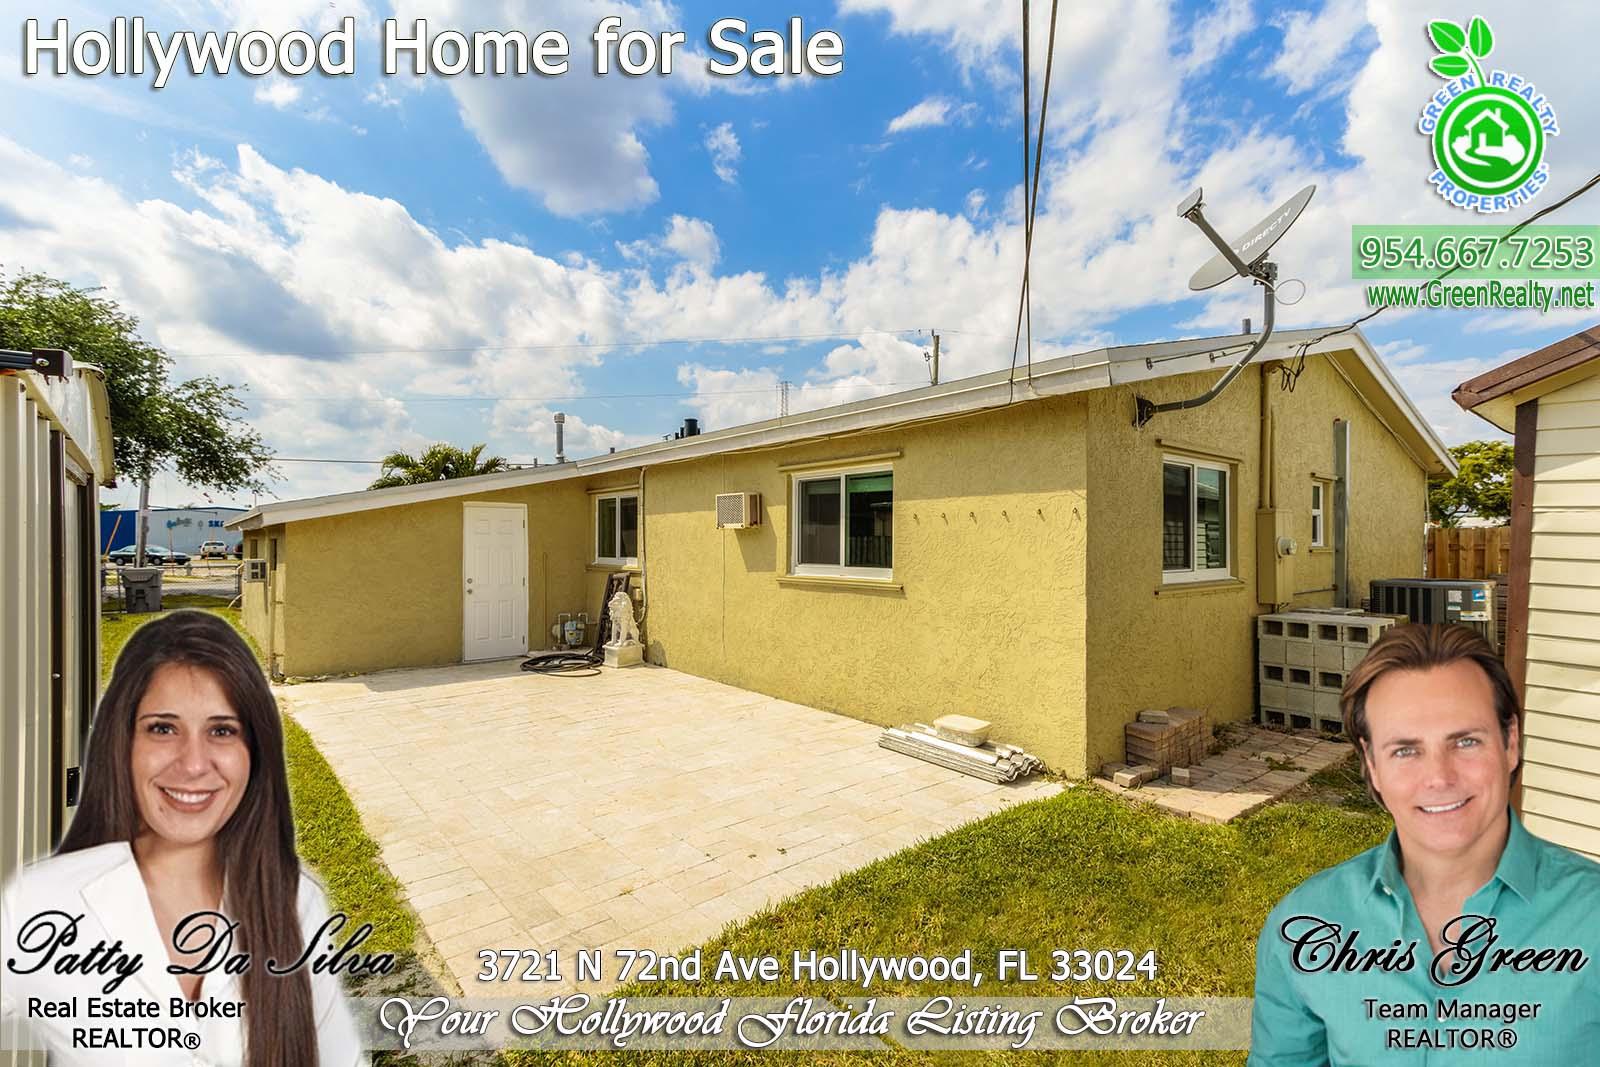 23 Hollywood Florida Real Estate Listing Patty Da Silva Green Realty properties (5)